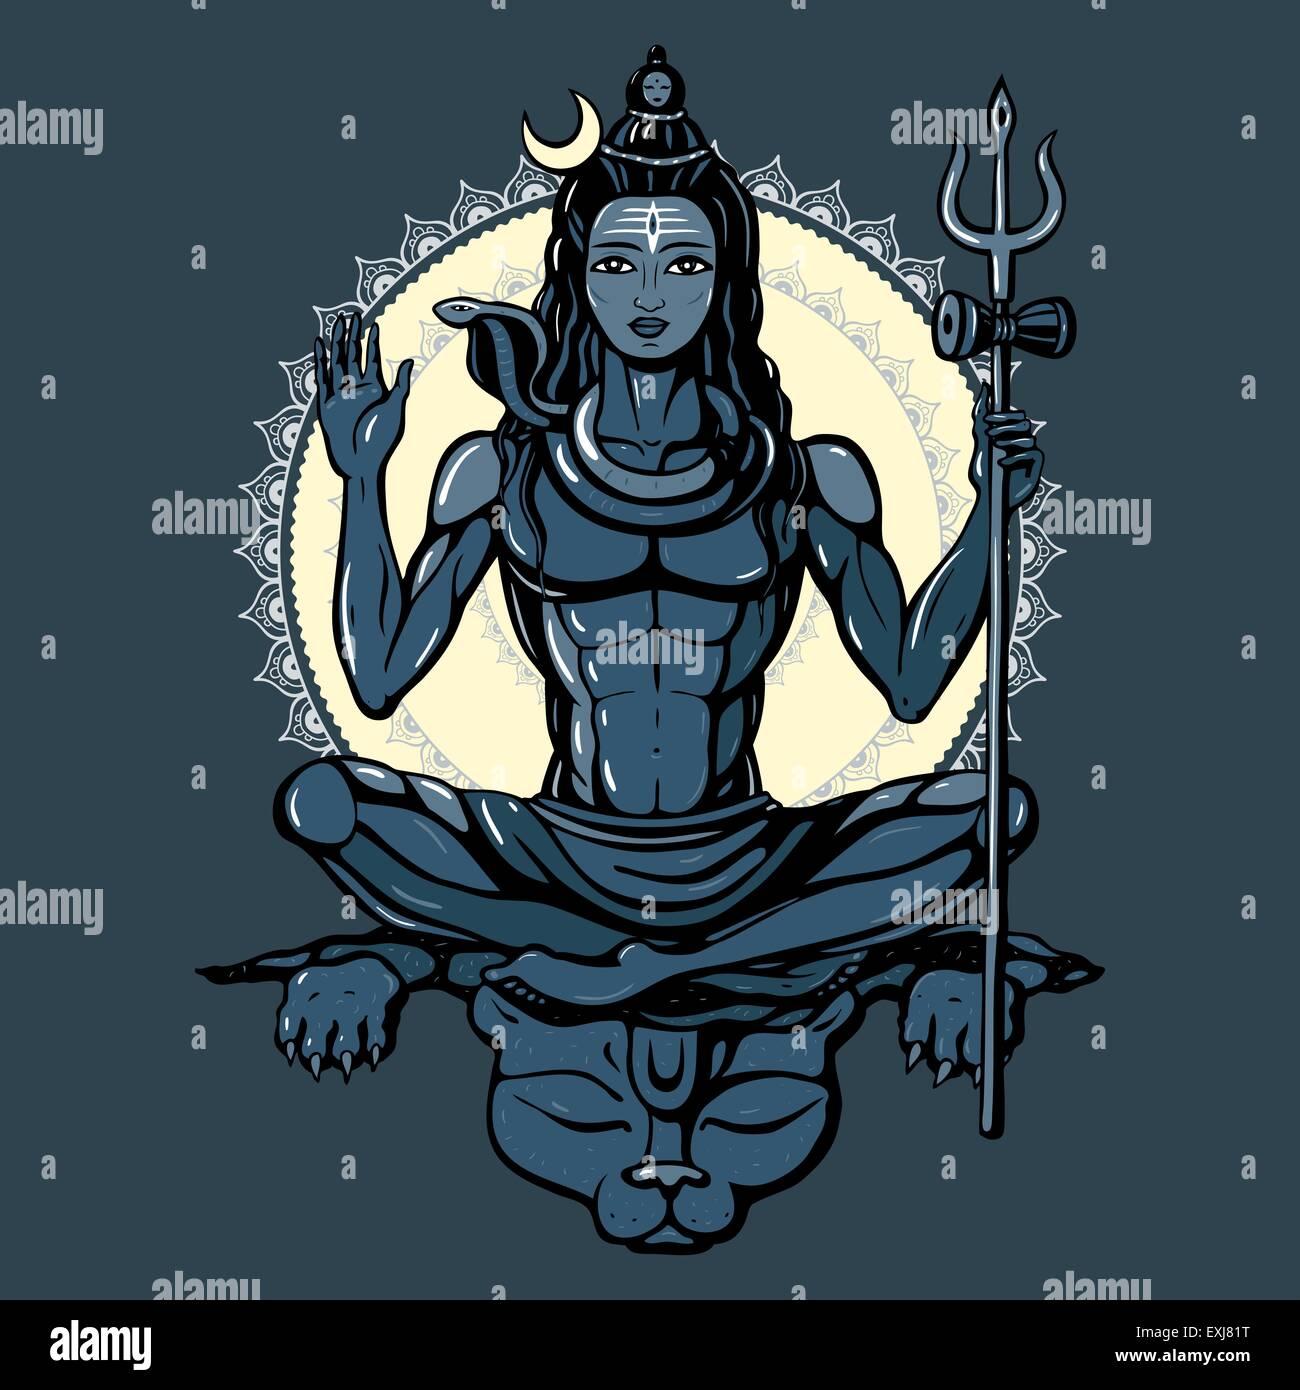 Hindu god Shiva - Stock Vector